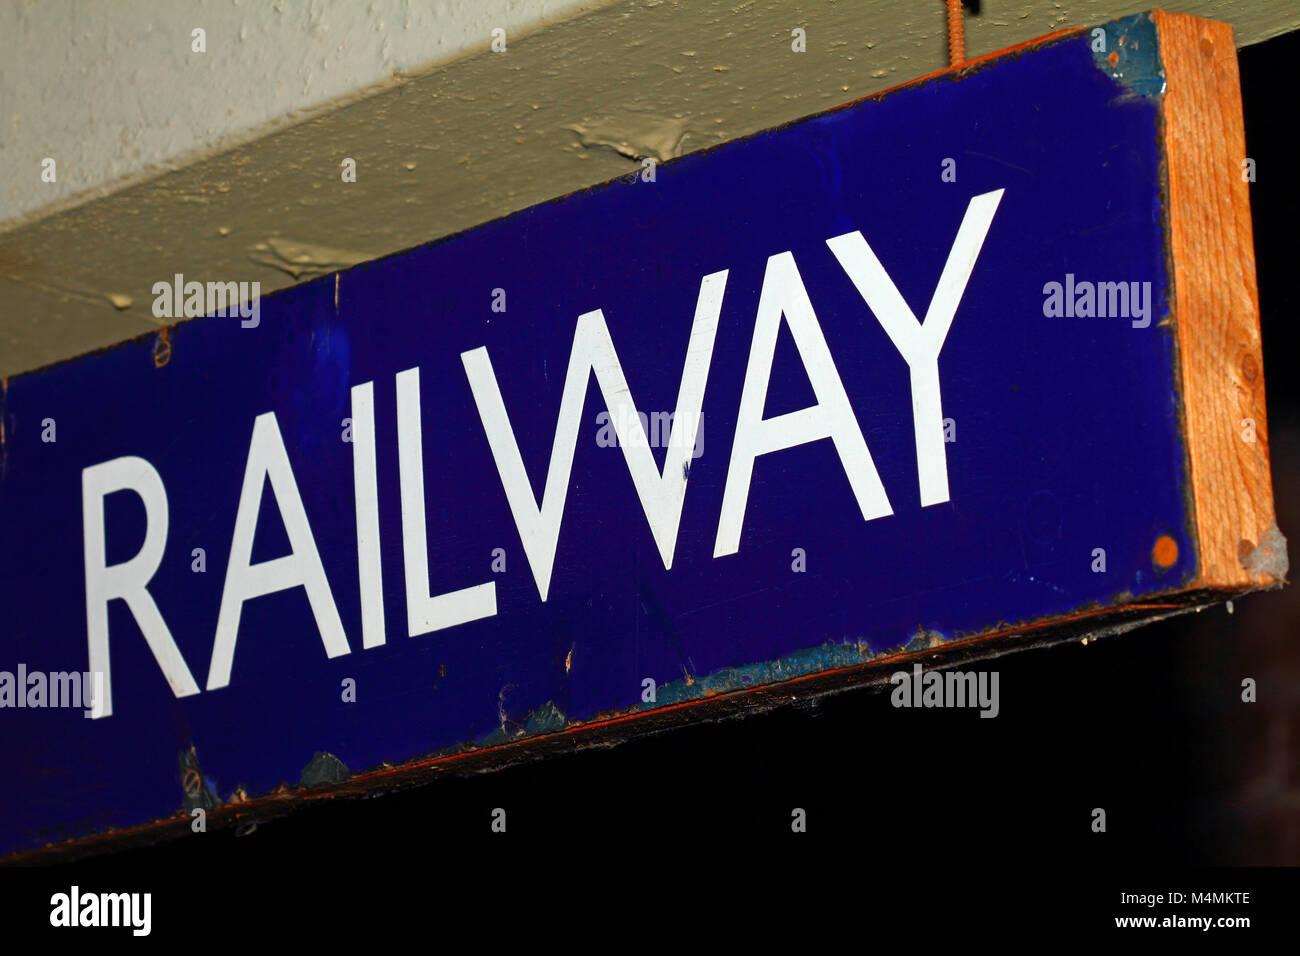 Old sign saying railway - Stock Image